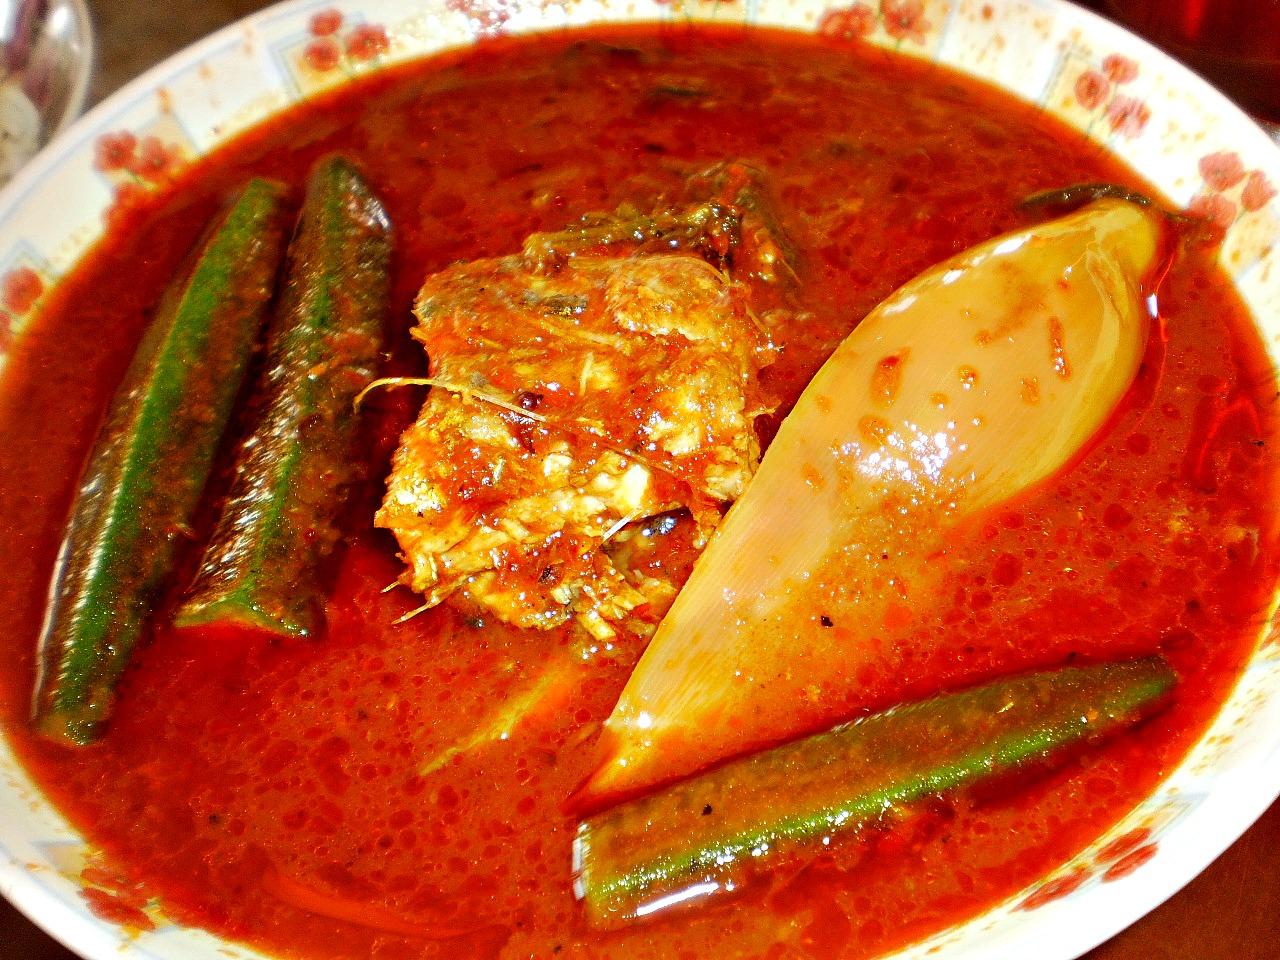 Resepi Asam Pedas Ayam Daun Limau Purut Copd Blog O